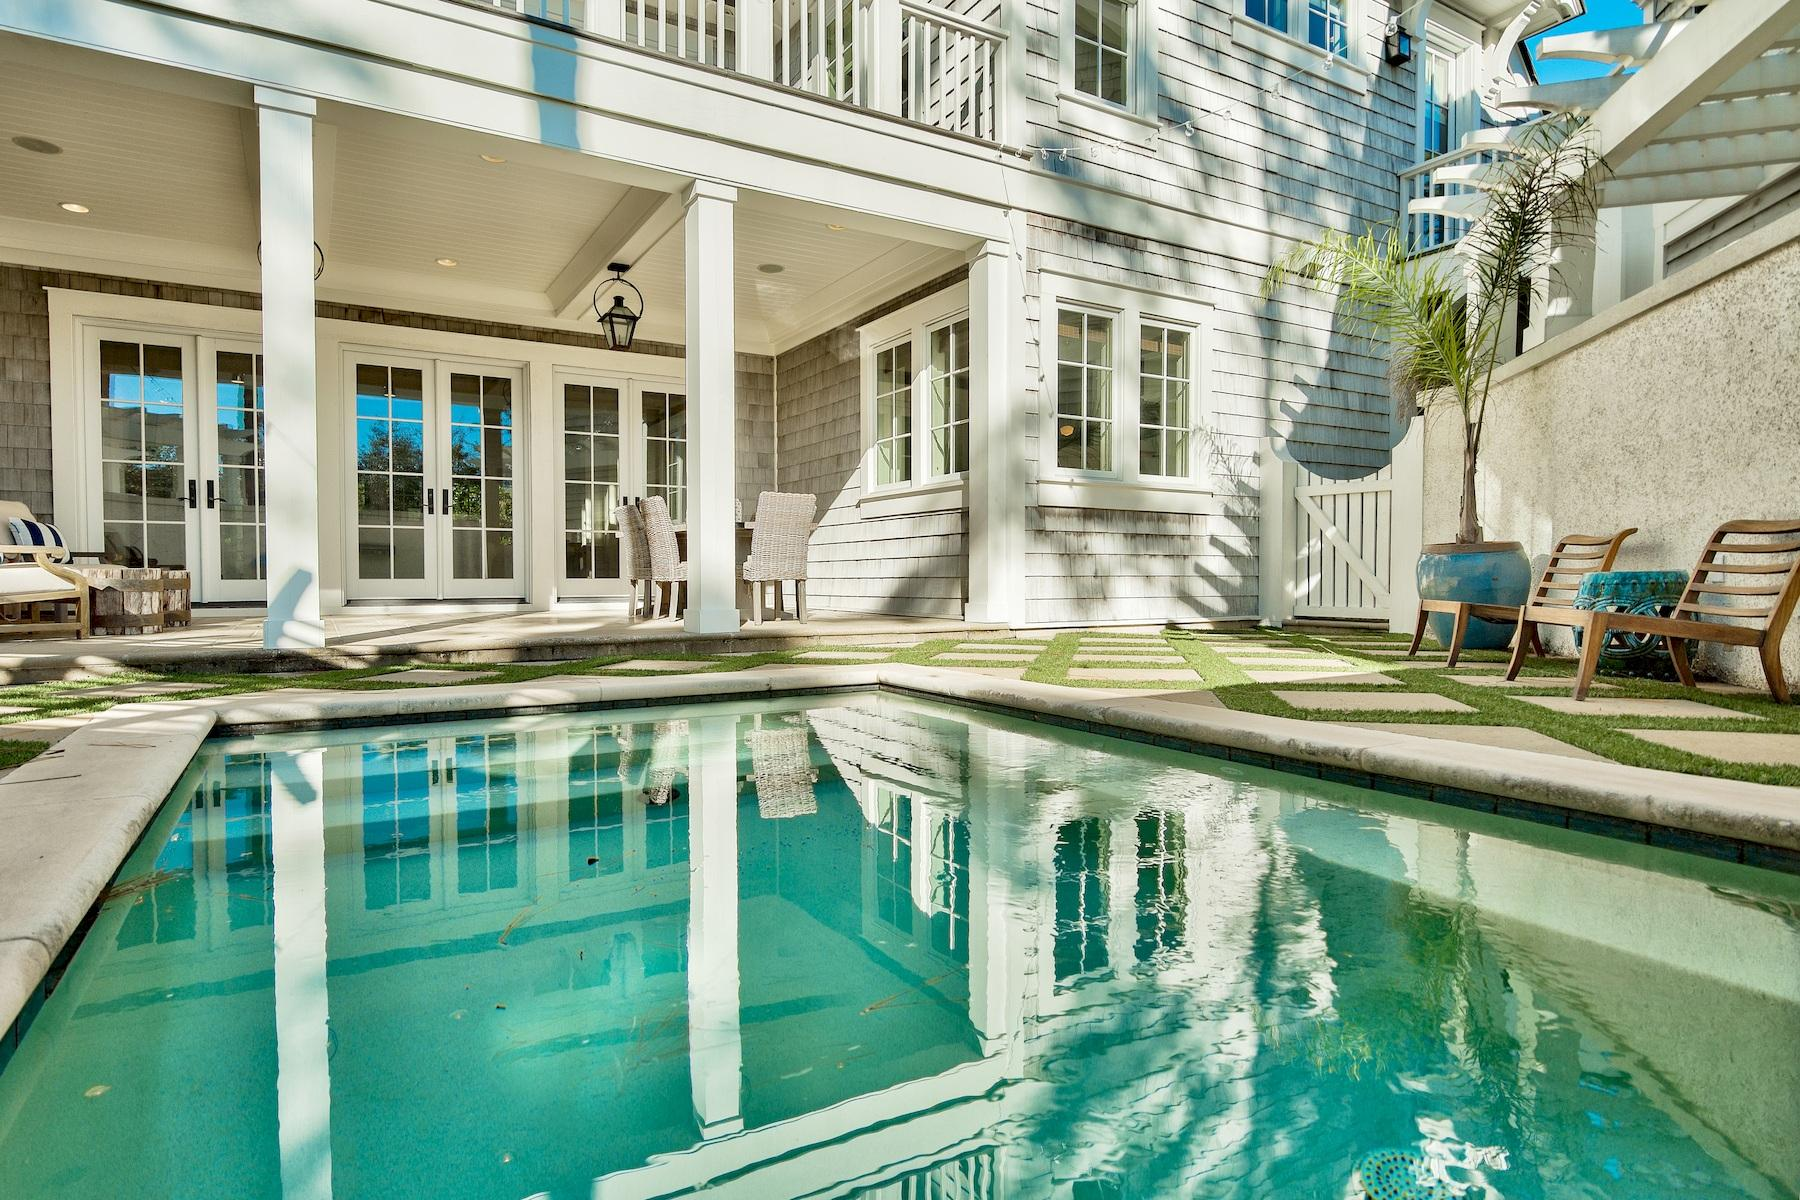 8 Shingle,Watersound,Florida 32461,6 Bedrooms Bedrooms,6 BathroomsBathrooms,Detached single family,Shingle,20131126143817002353000000